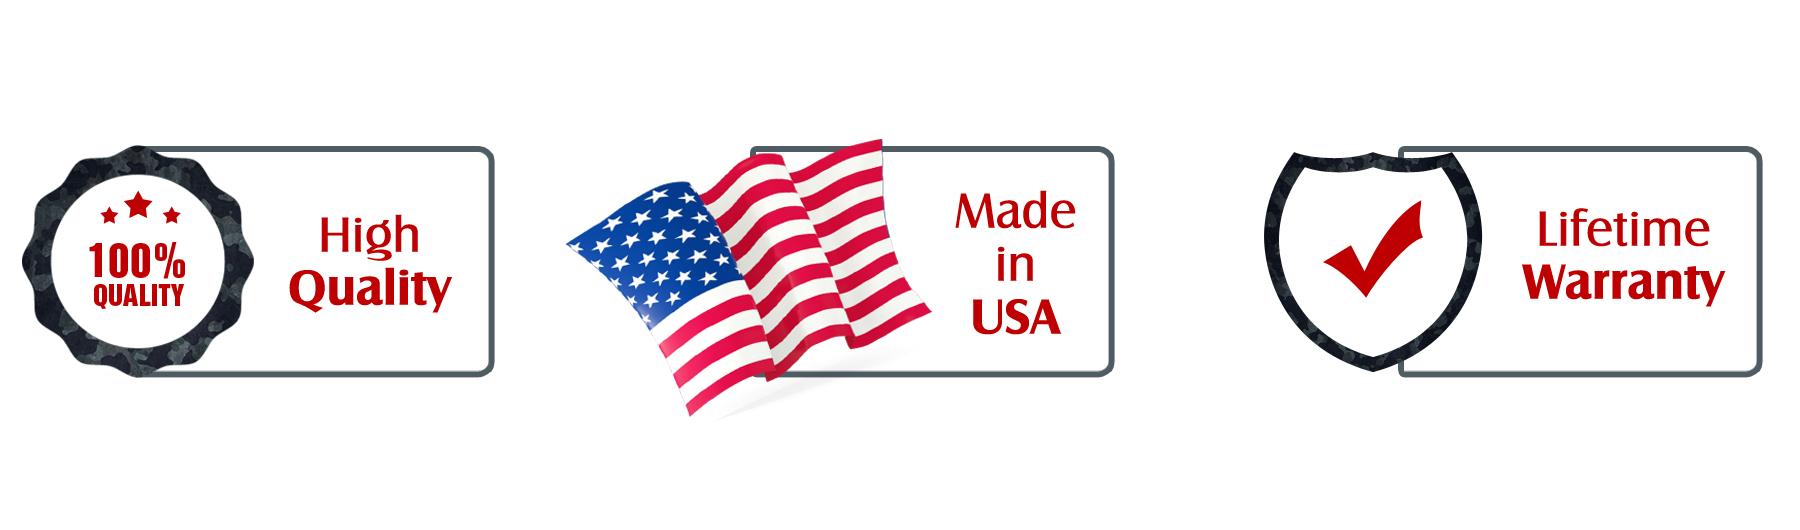 Quality, Made in USA, Lifetime Warranty